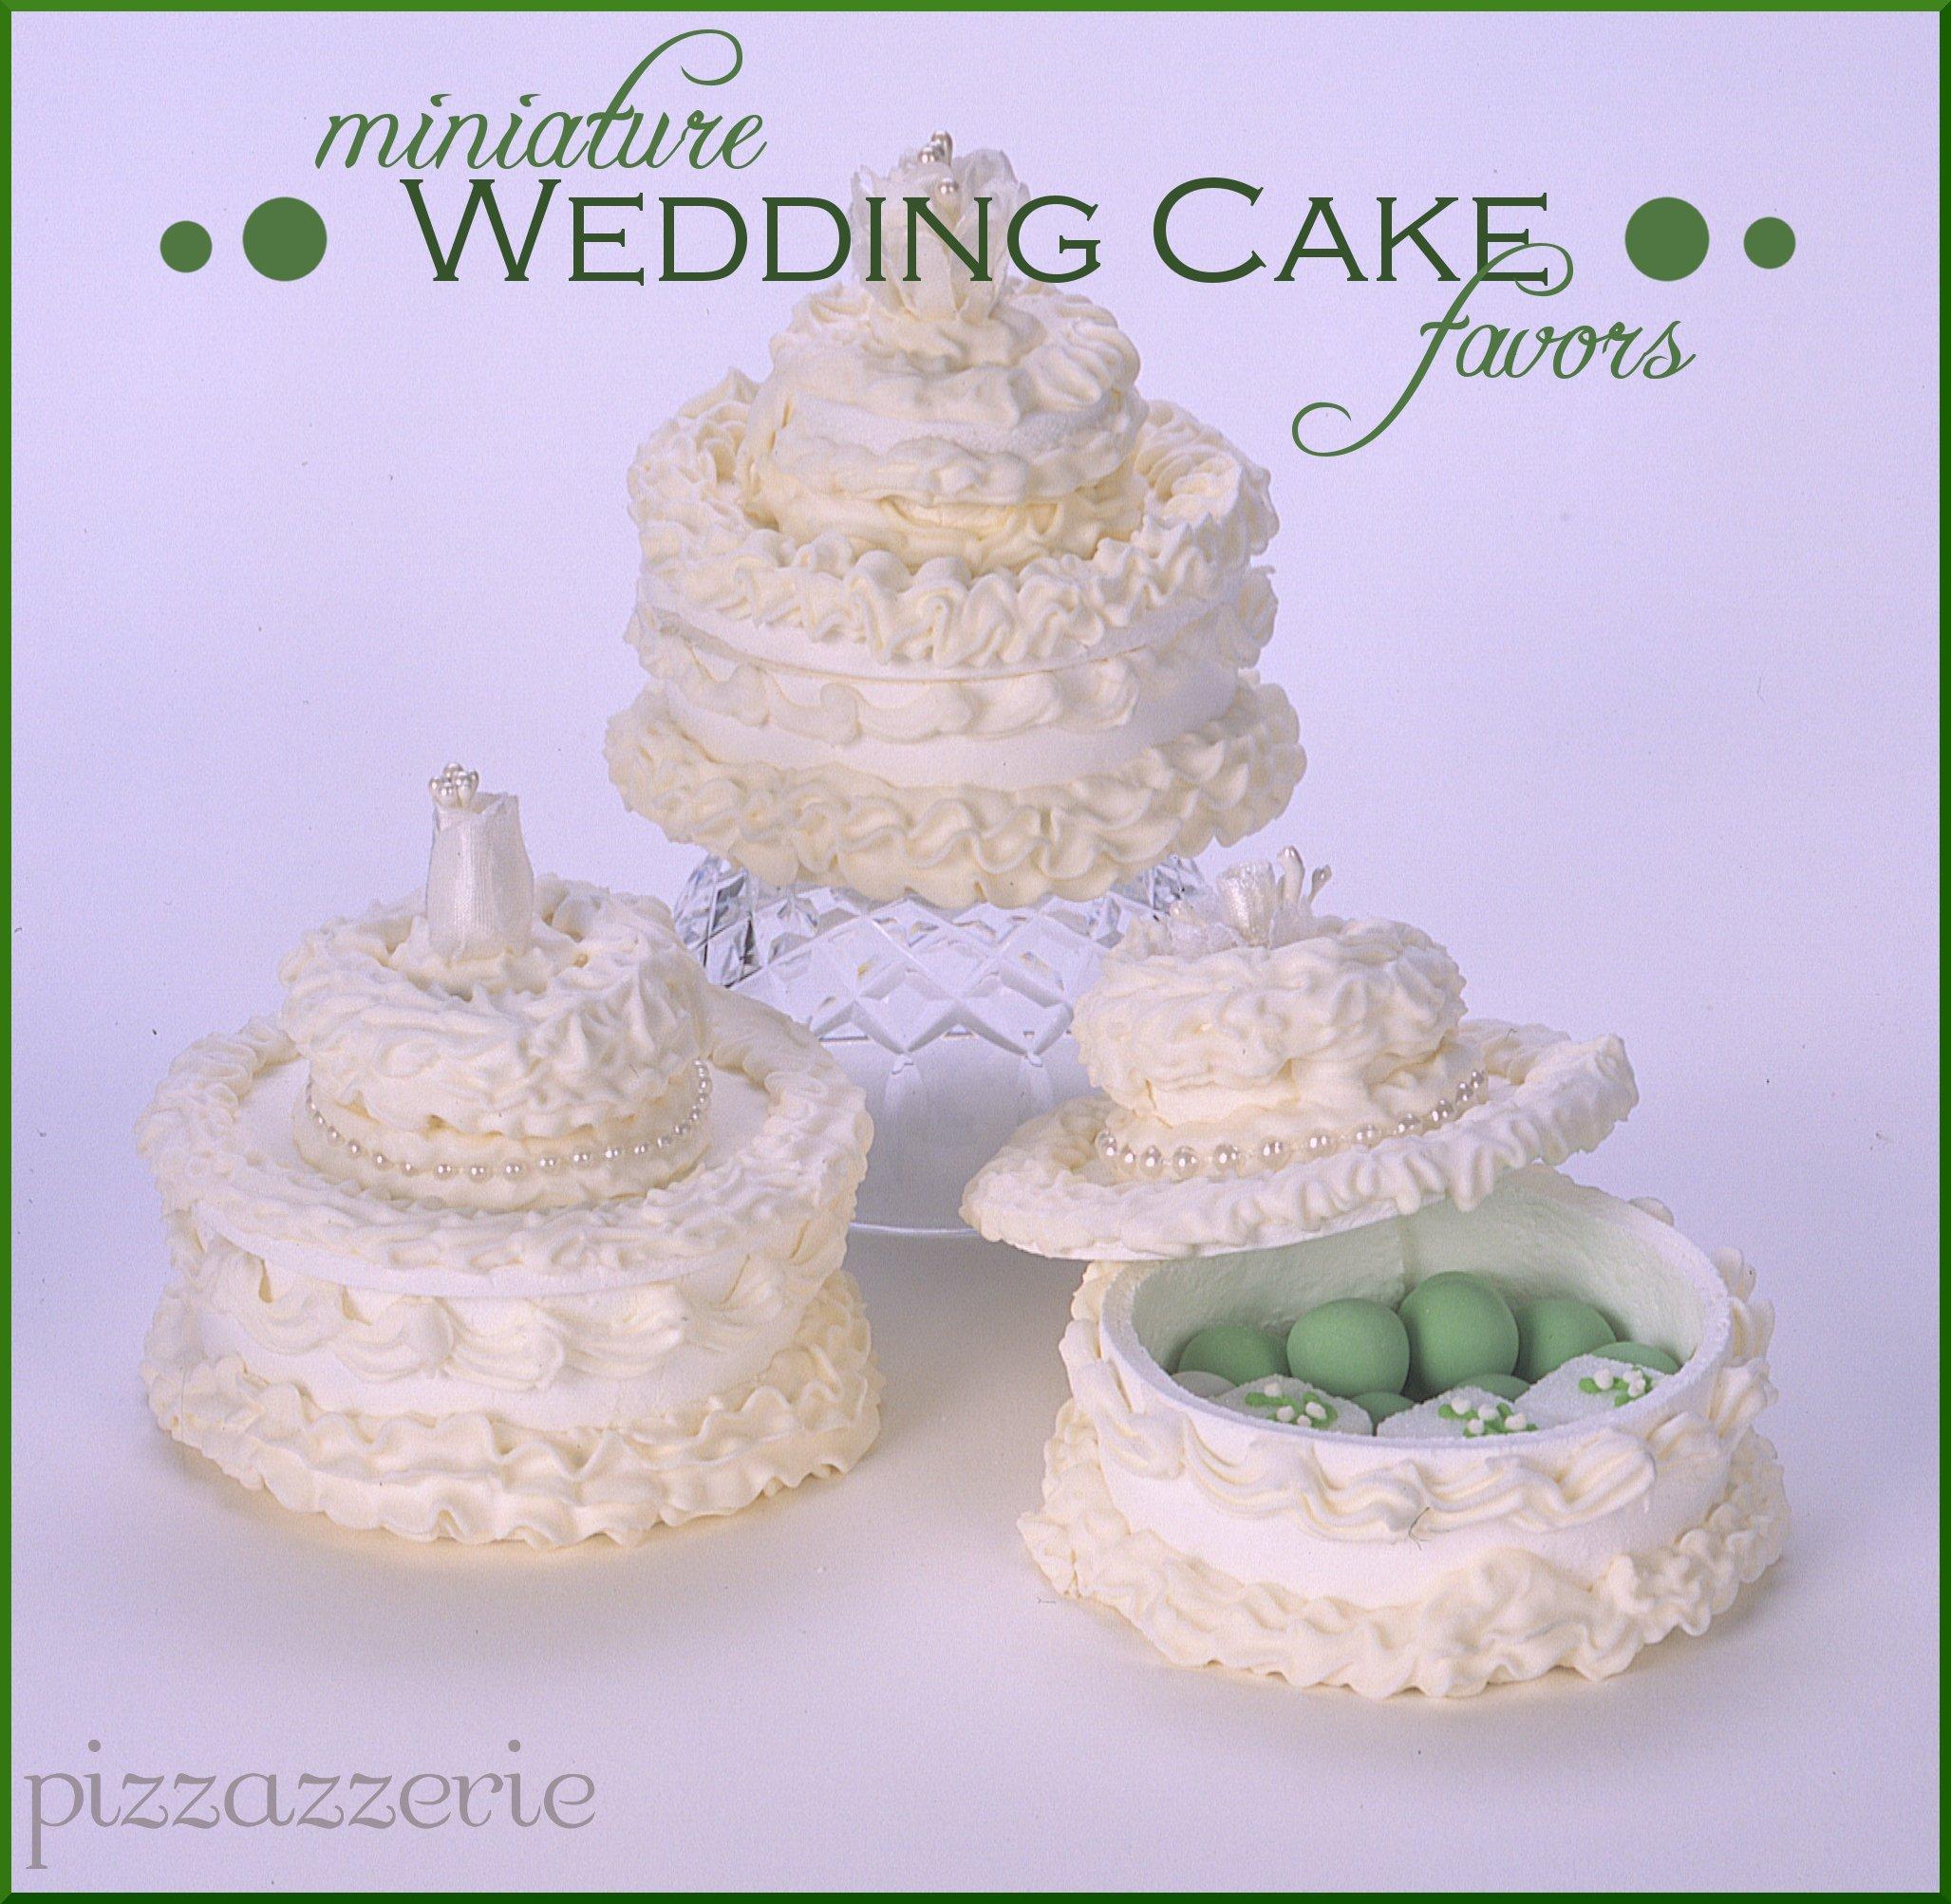 Bridesmaid Luncheon Miniature Wedding Cake Favors Pizzazzerie